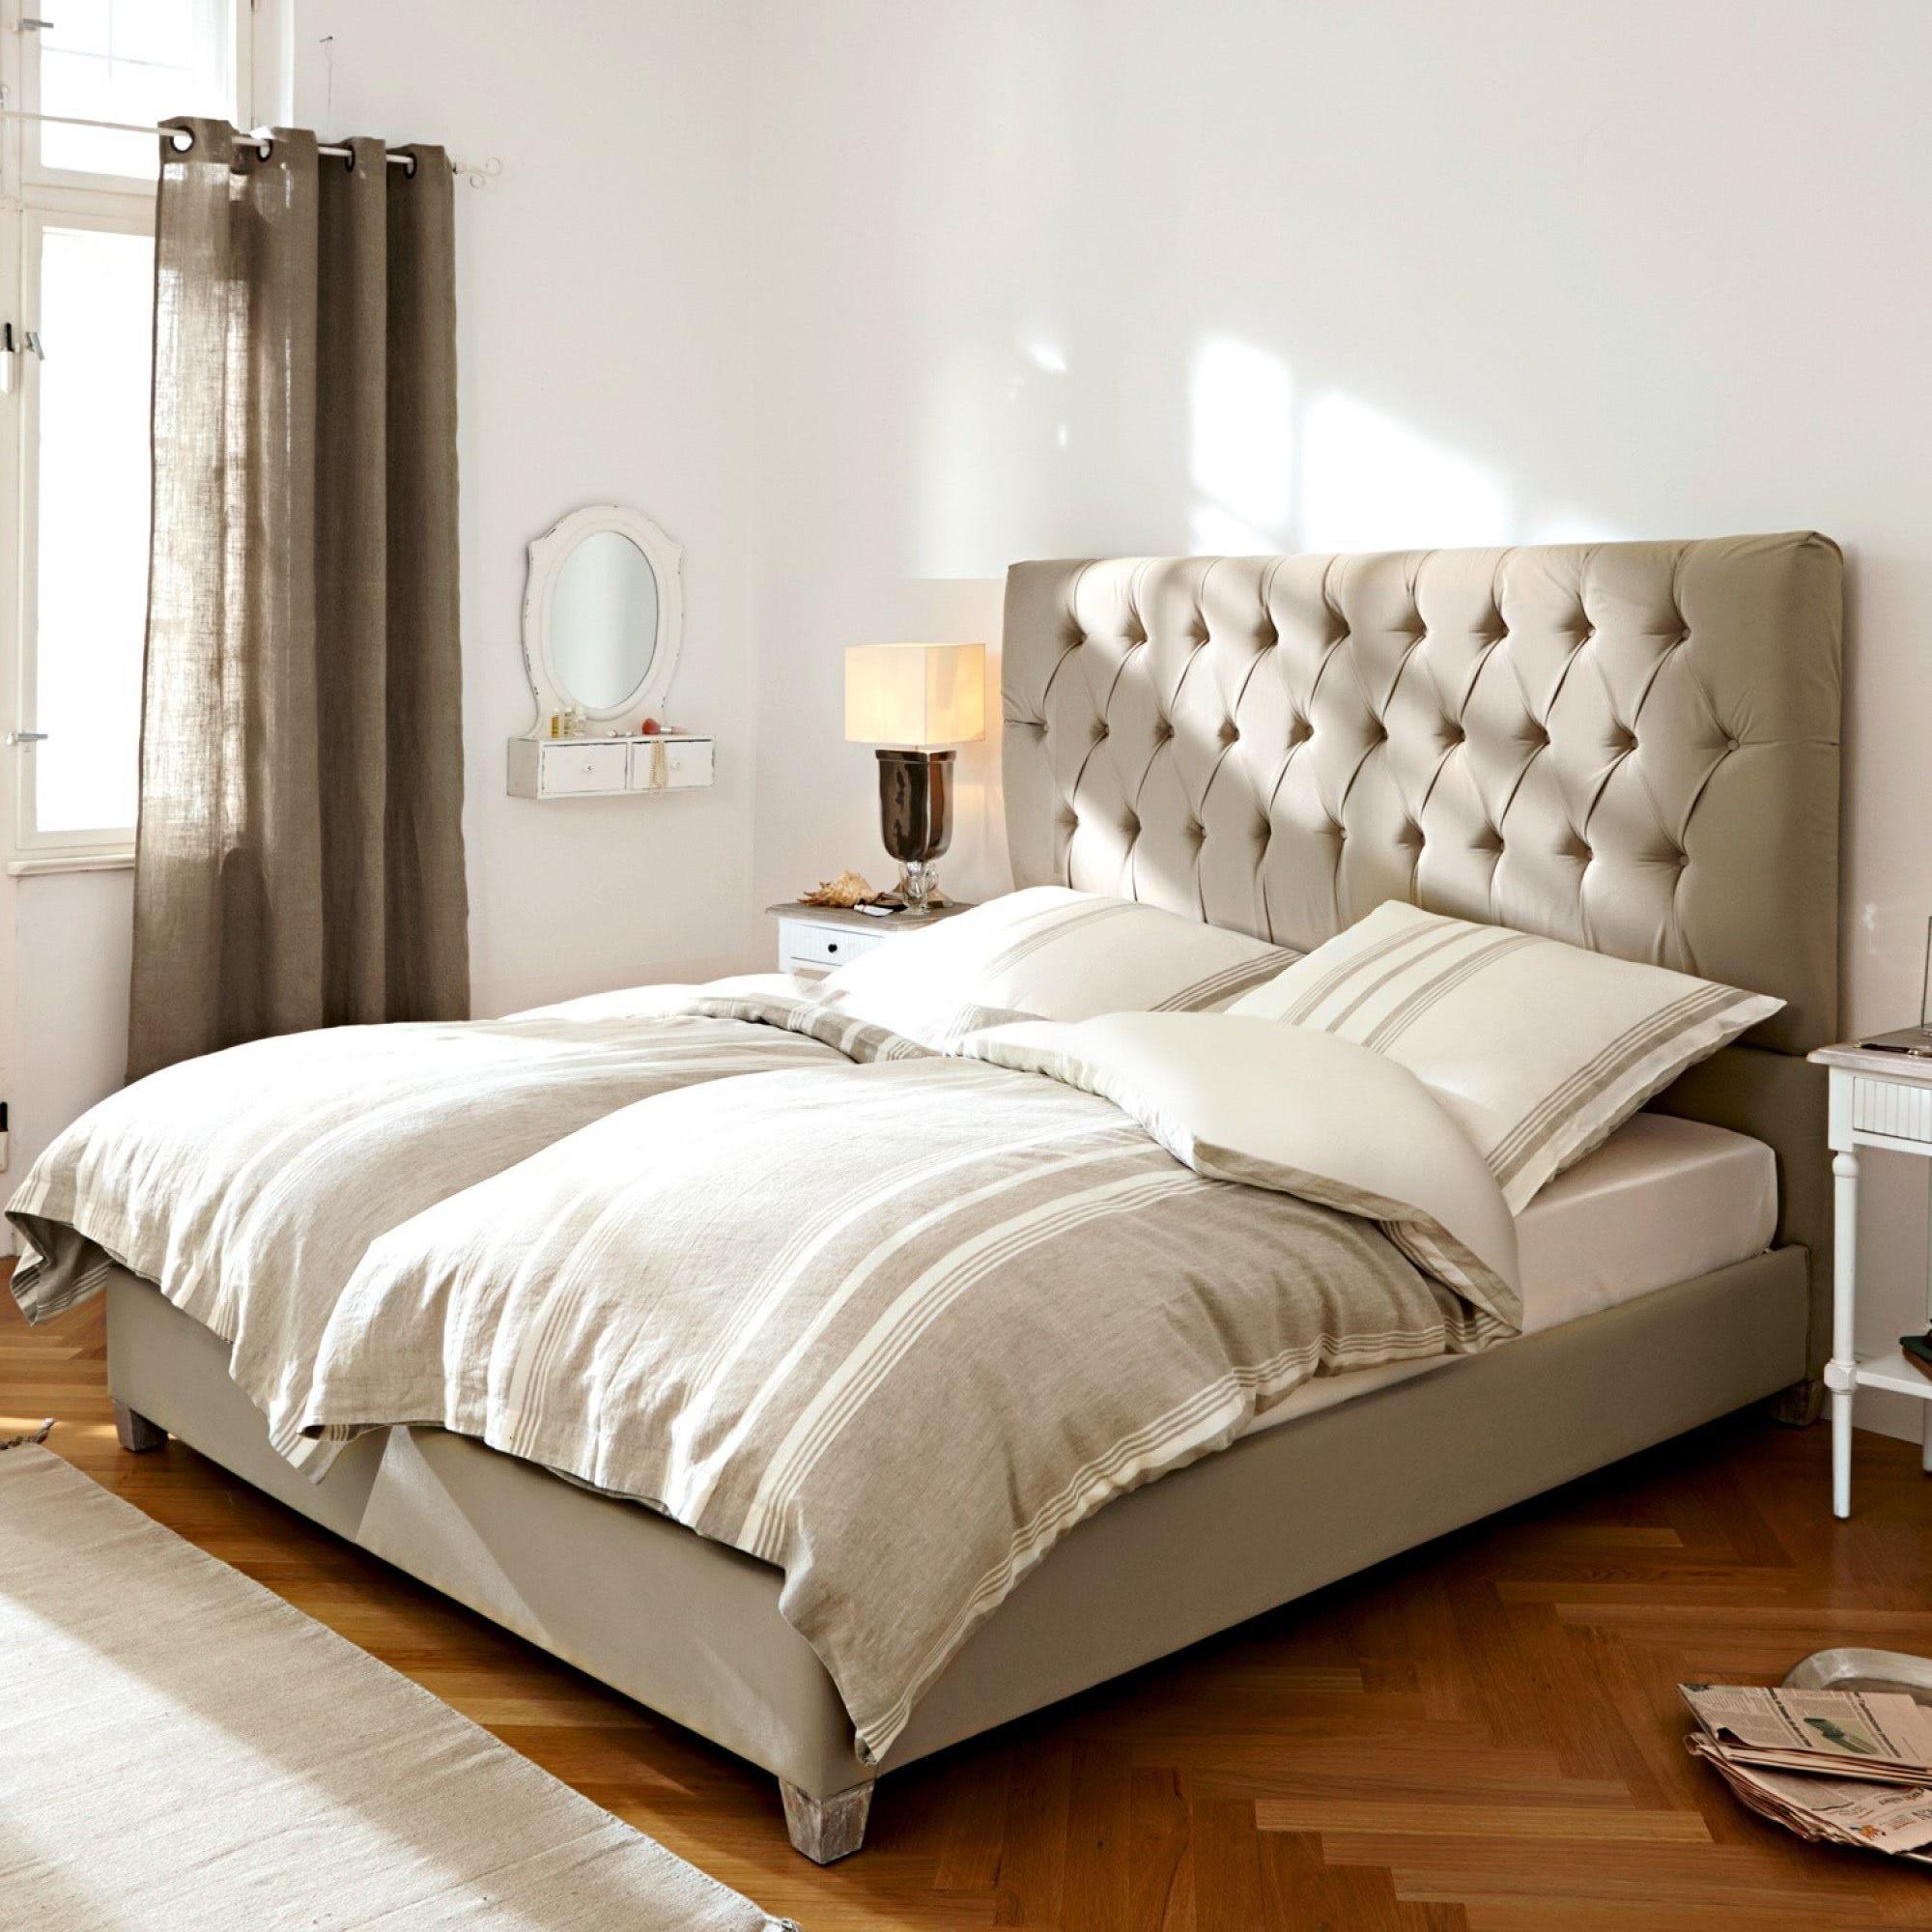 79 Minimalist Bett 24 De Haus deko, Betten günstig